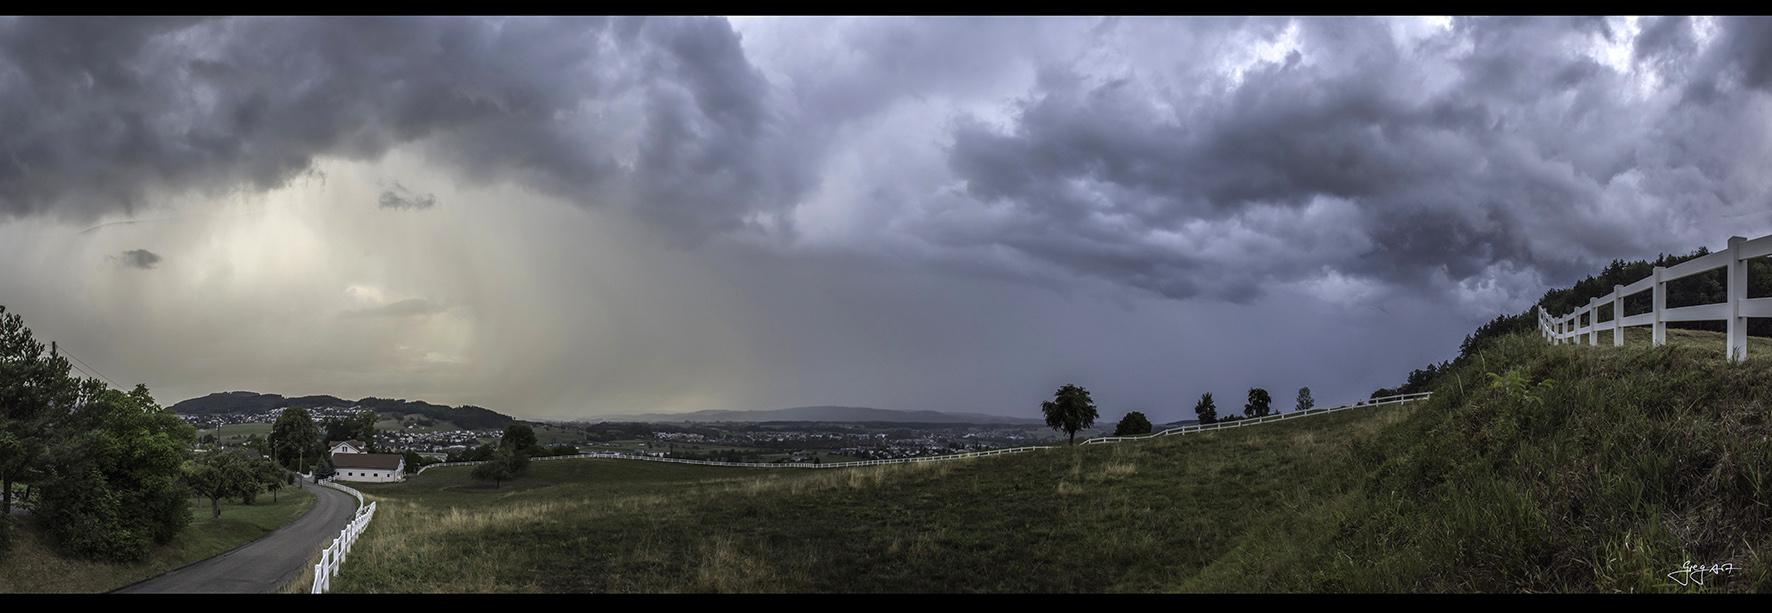 Thunderstorm-1